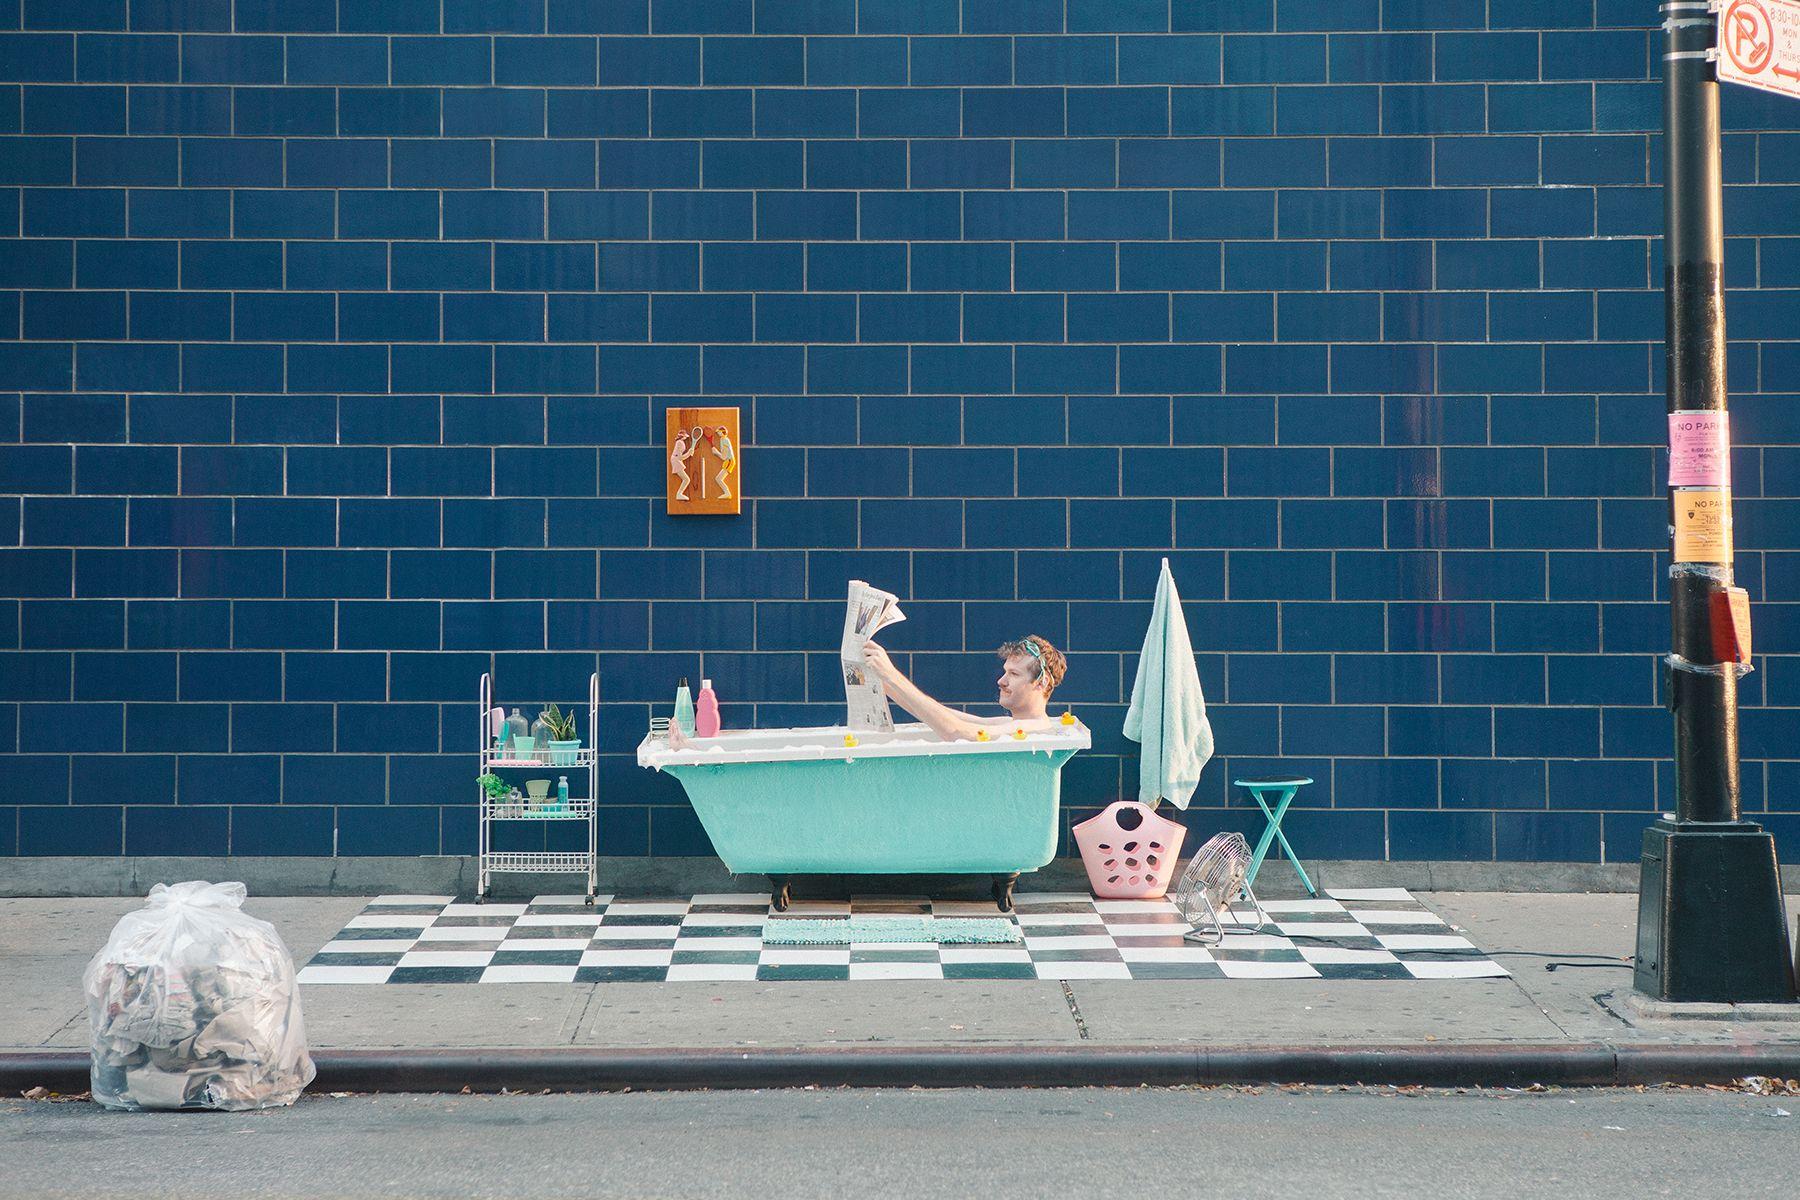 set-in-the-street-outdoor-rooms-in-new-york-city-2